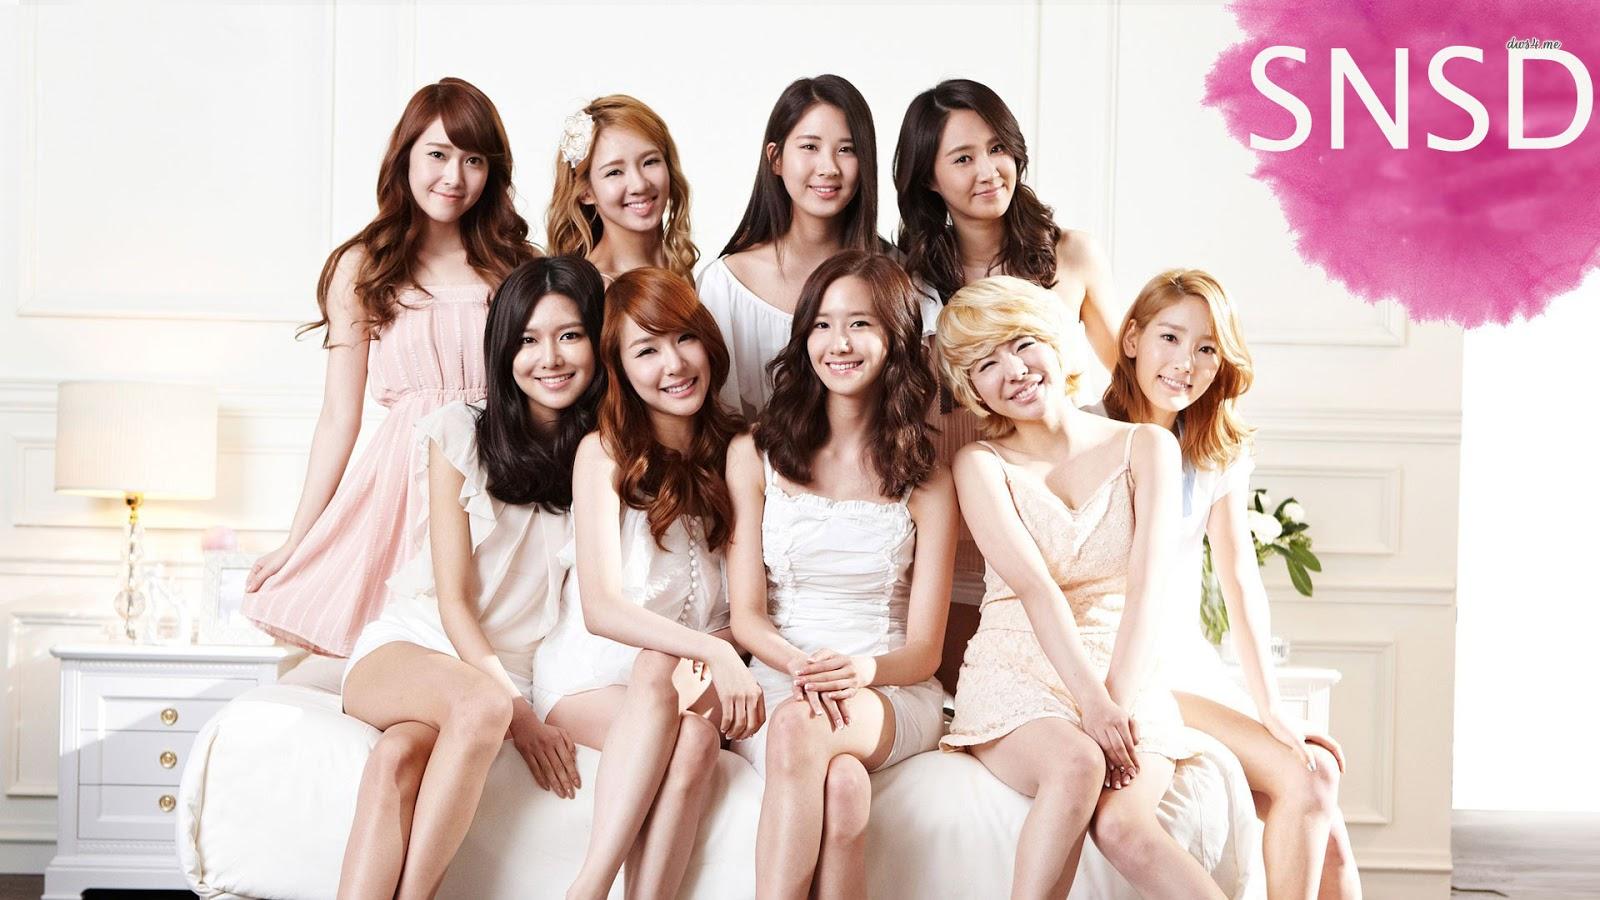 45 Girls Generation Wallpaper On Wallpapersafari